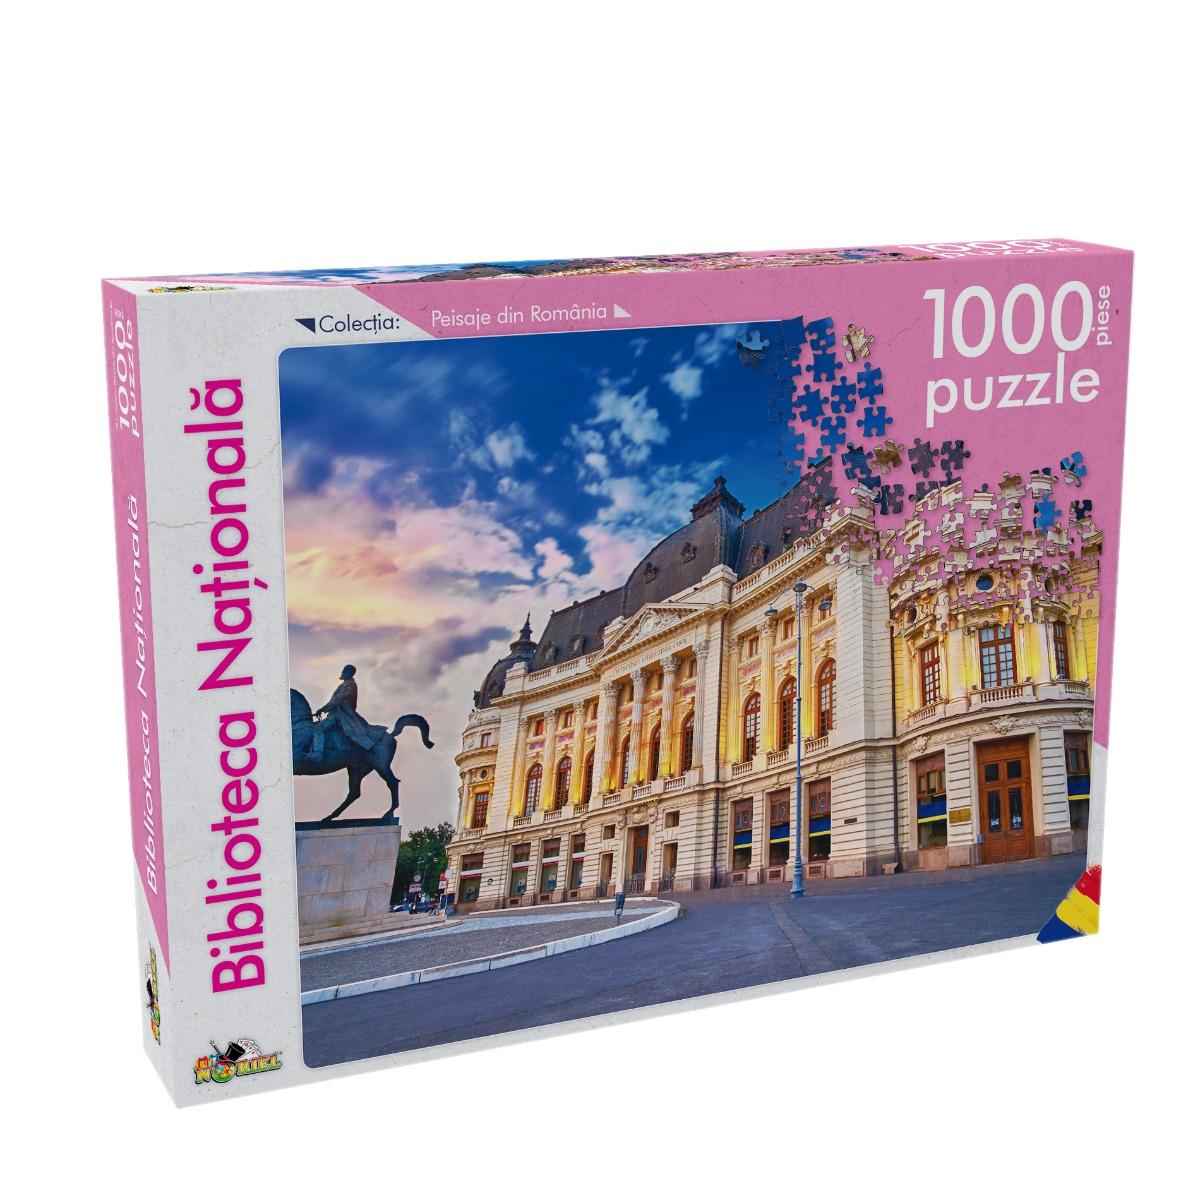 Puzzle Noriel - Peisaje din Romania - Biblioteca Nationala. 1000 Piese